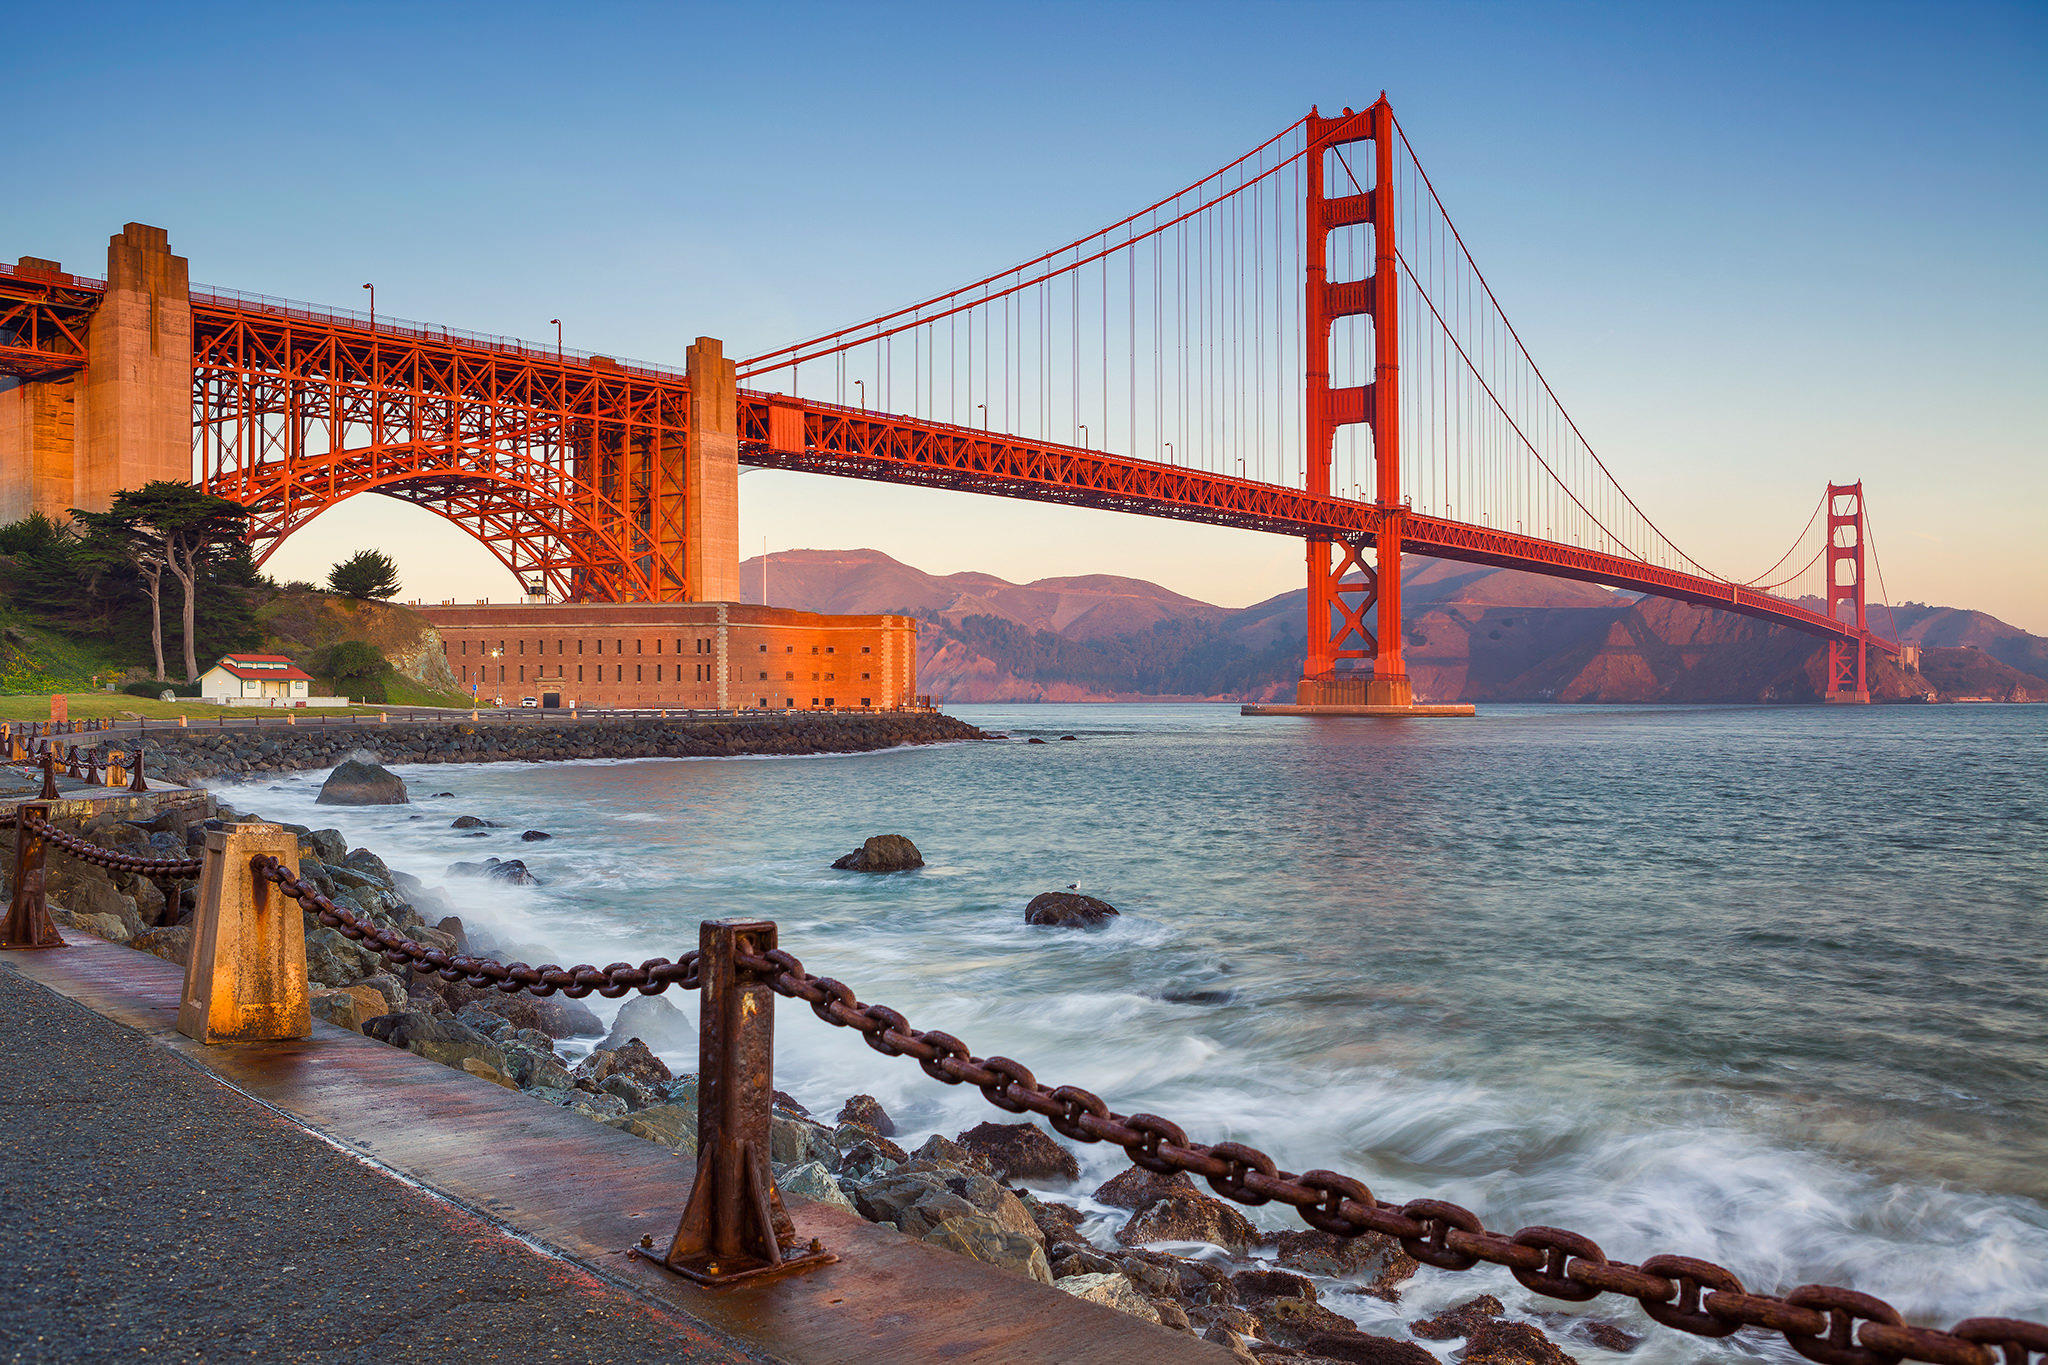 обои Мост Золотые ворота в Сан-Франциско, Golden Gate Bridge, San Francisco картинки фото